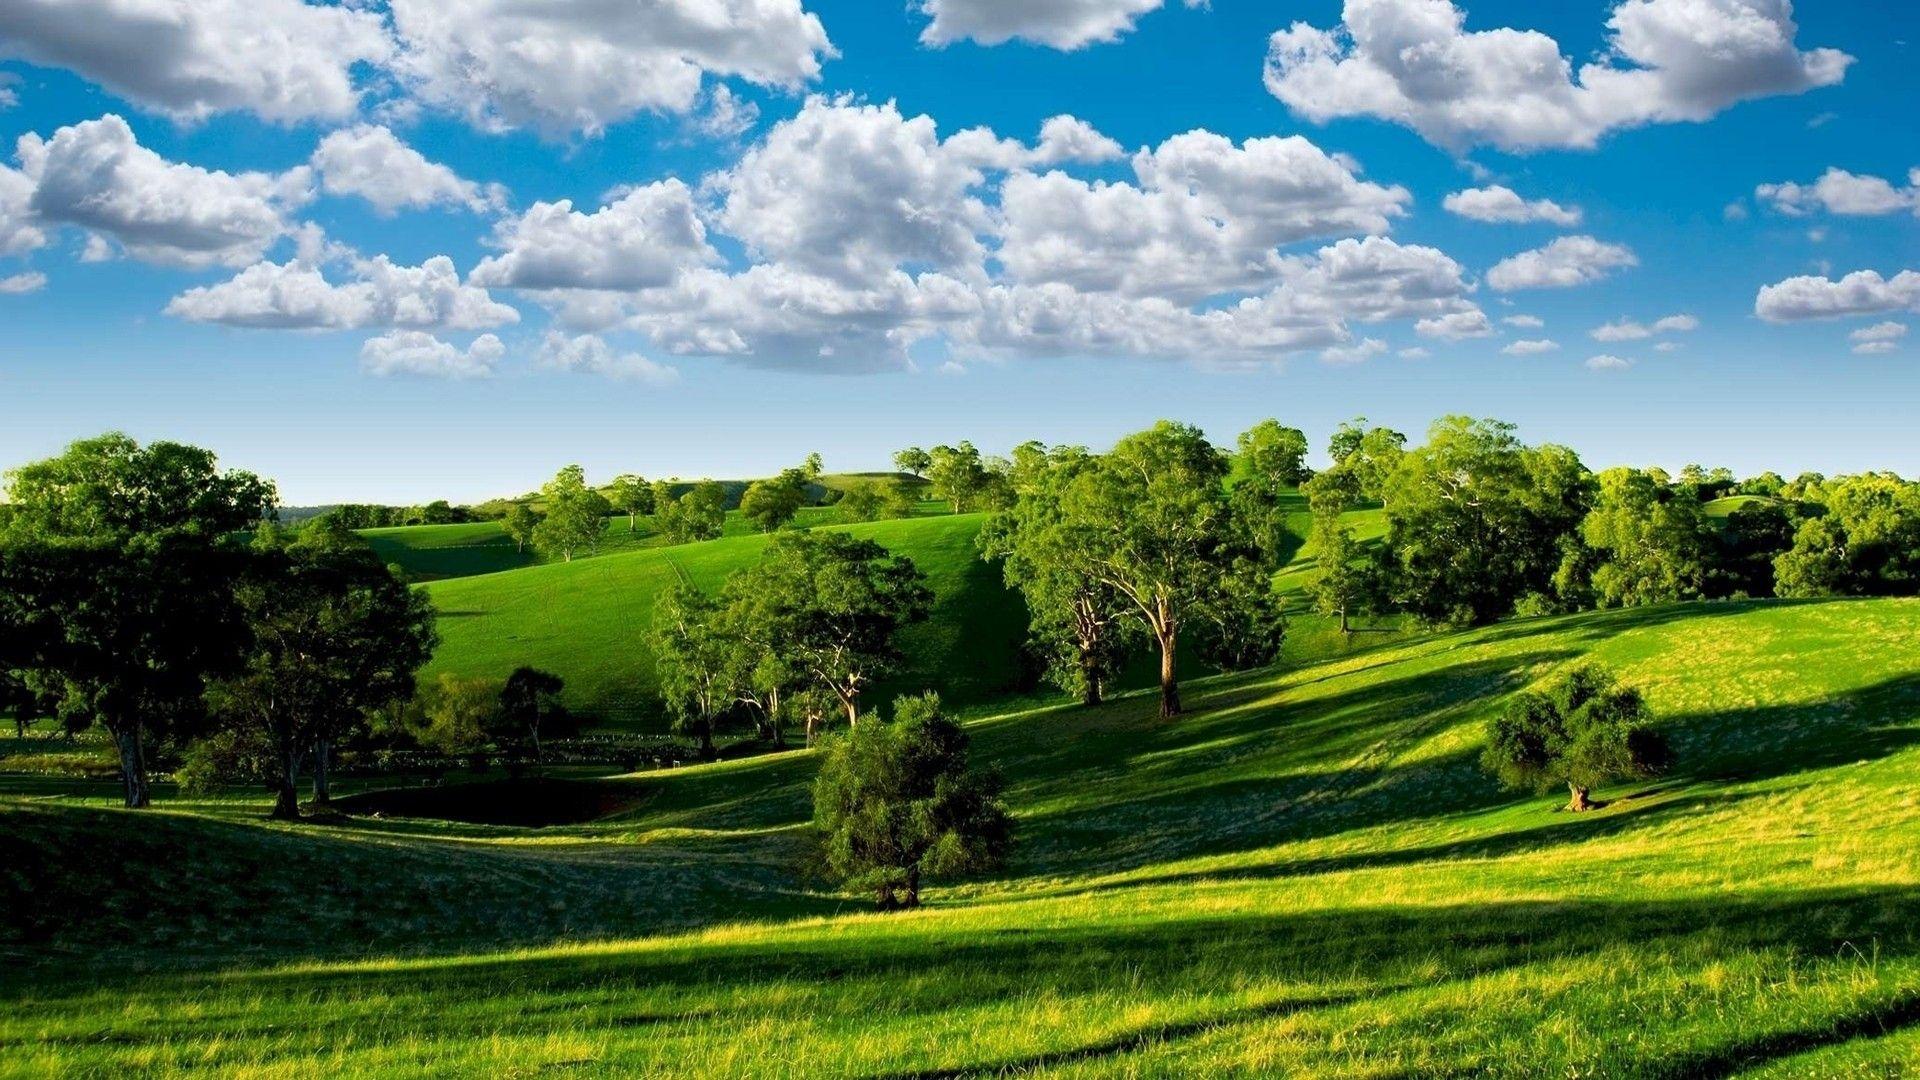 Hd Landscape Desktop Wallpaper Natura